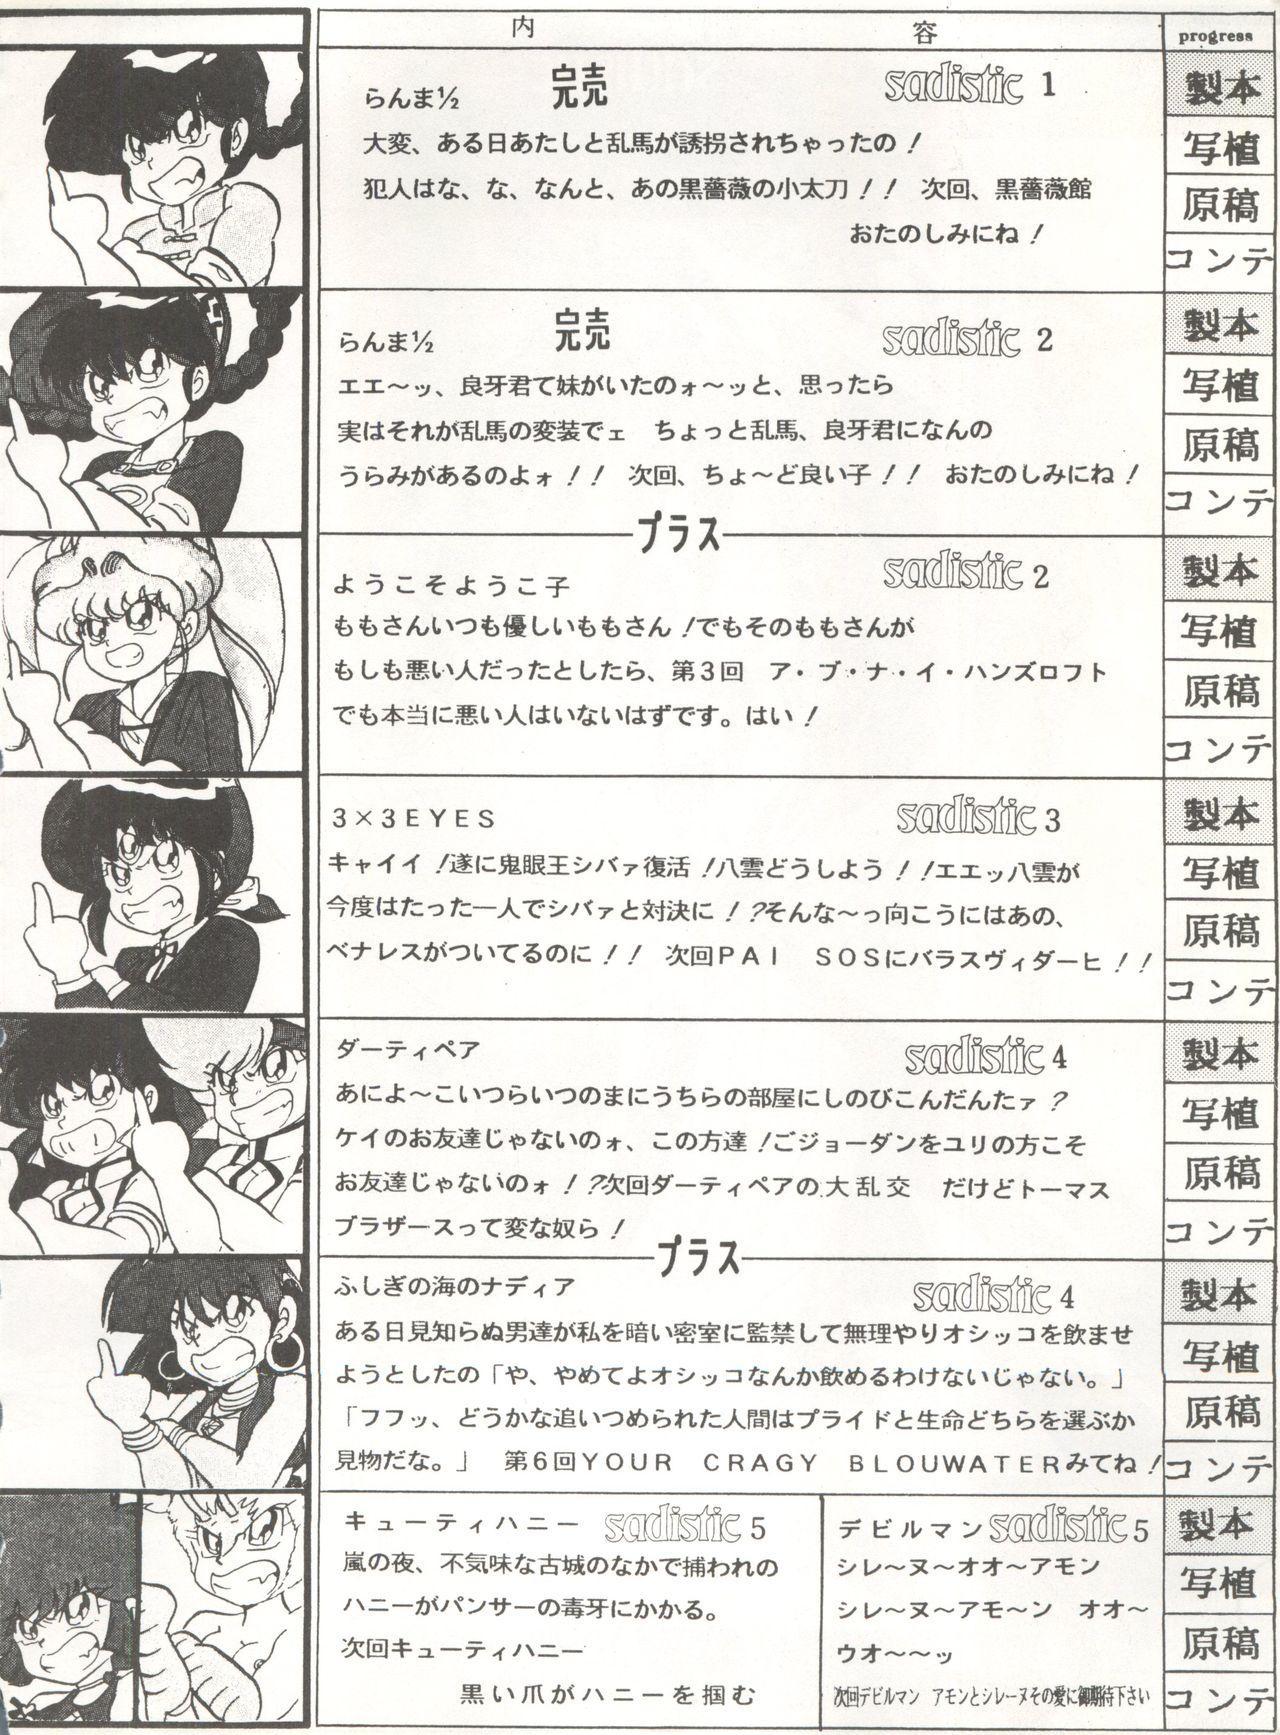 [Global One (MARO)] Sadistic 5 (Cutey Honey, Devilman, Sailor Moon), [Global One (MARO)] Sadistic (Dirty Pair, Fushigi no Umi no Nadia, Sailor Moon), [Studio Ikkatsumajin] .ribbon (Hime-chan's Ribbon) 121